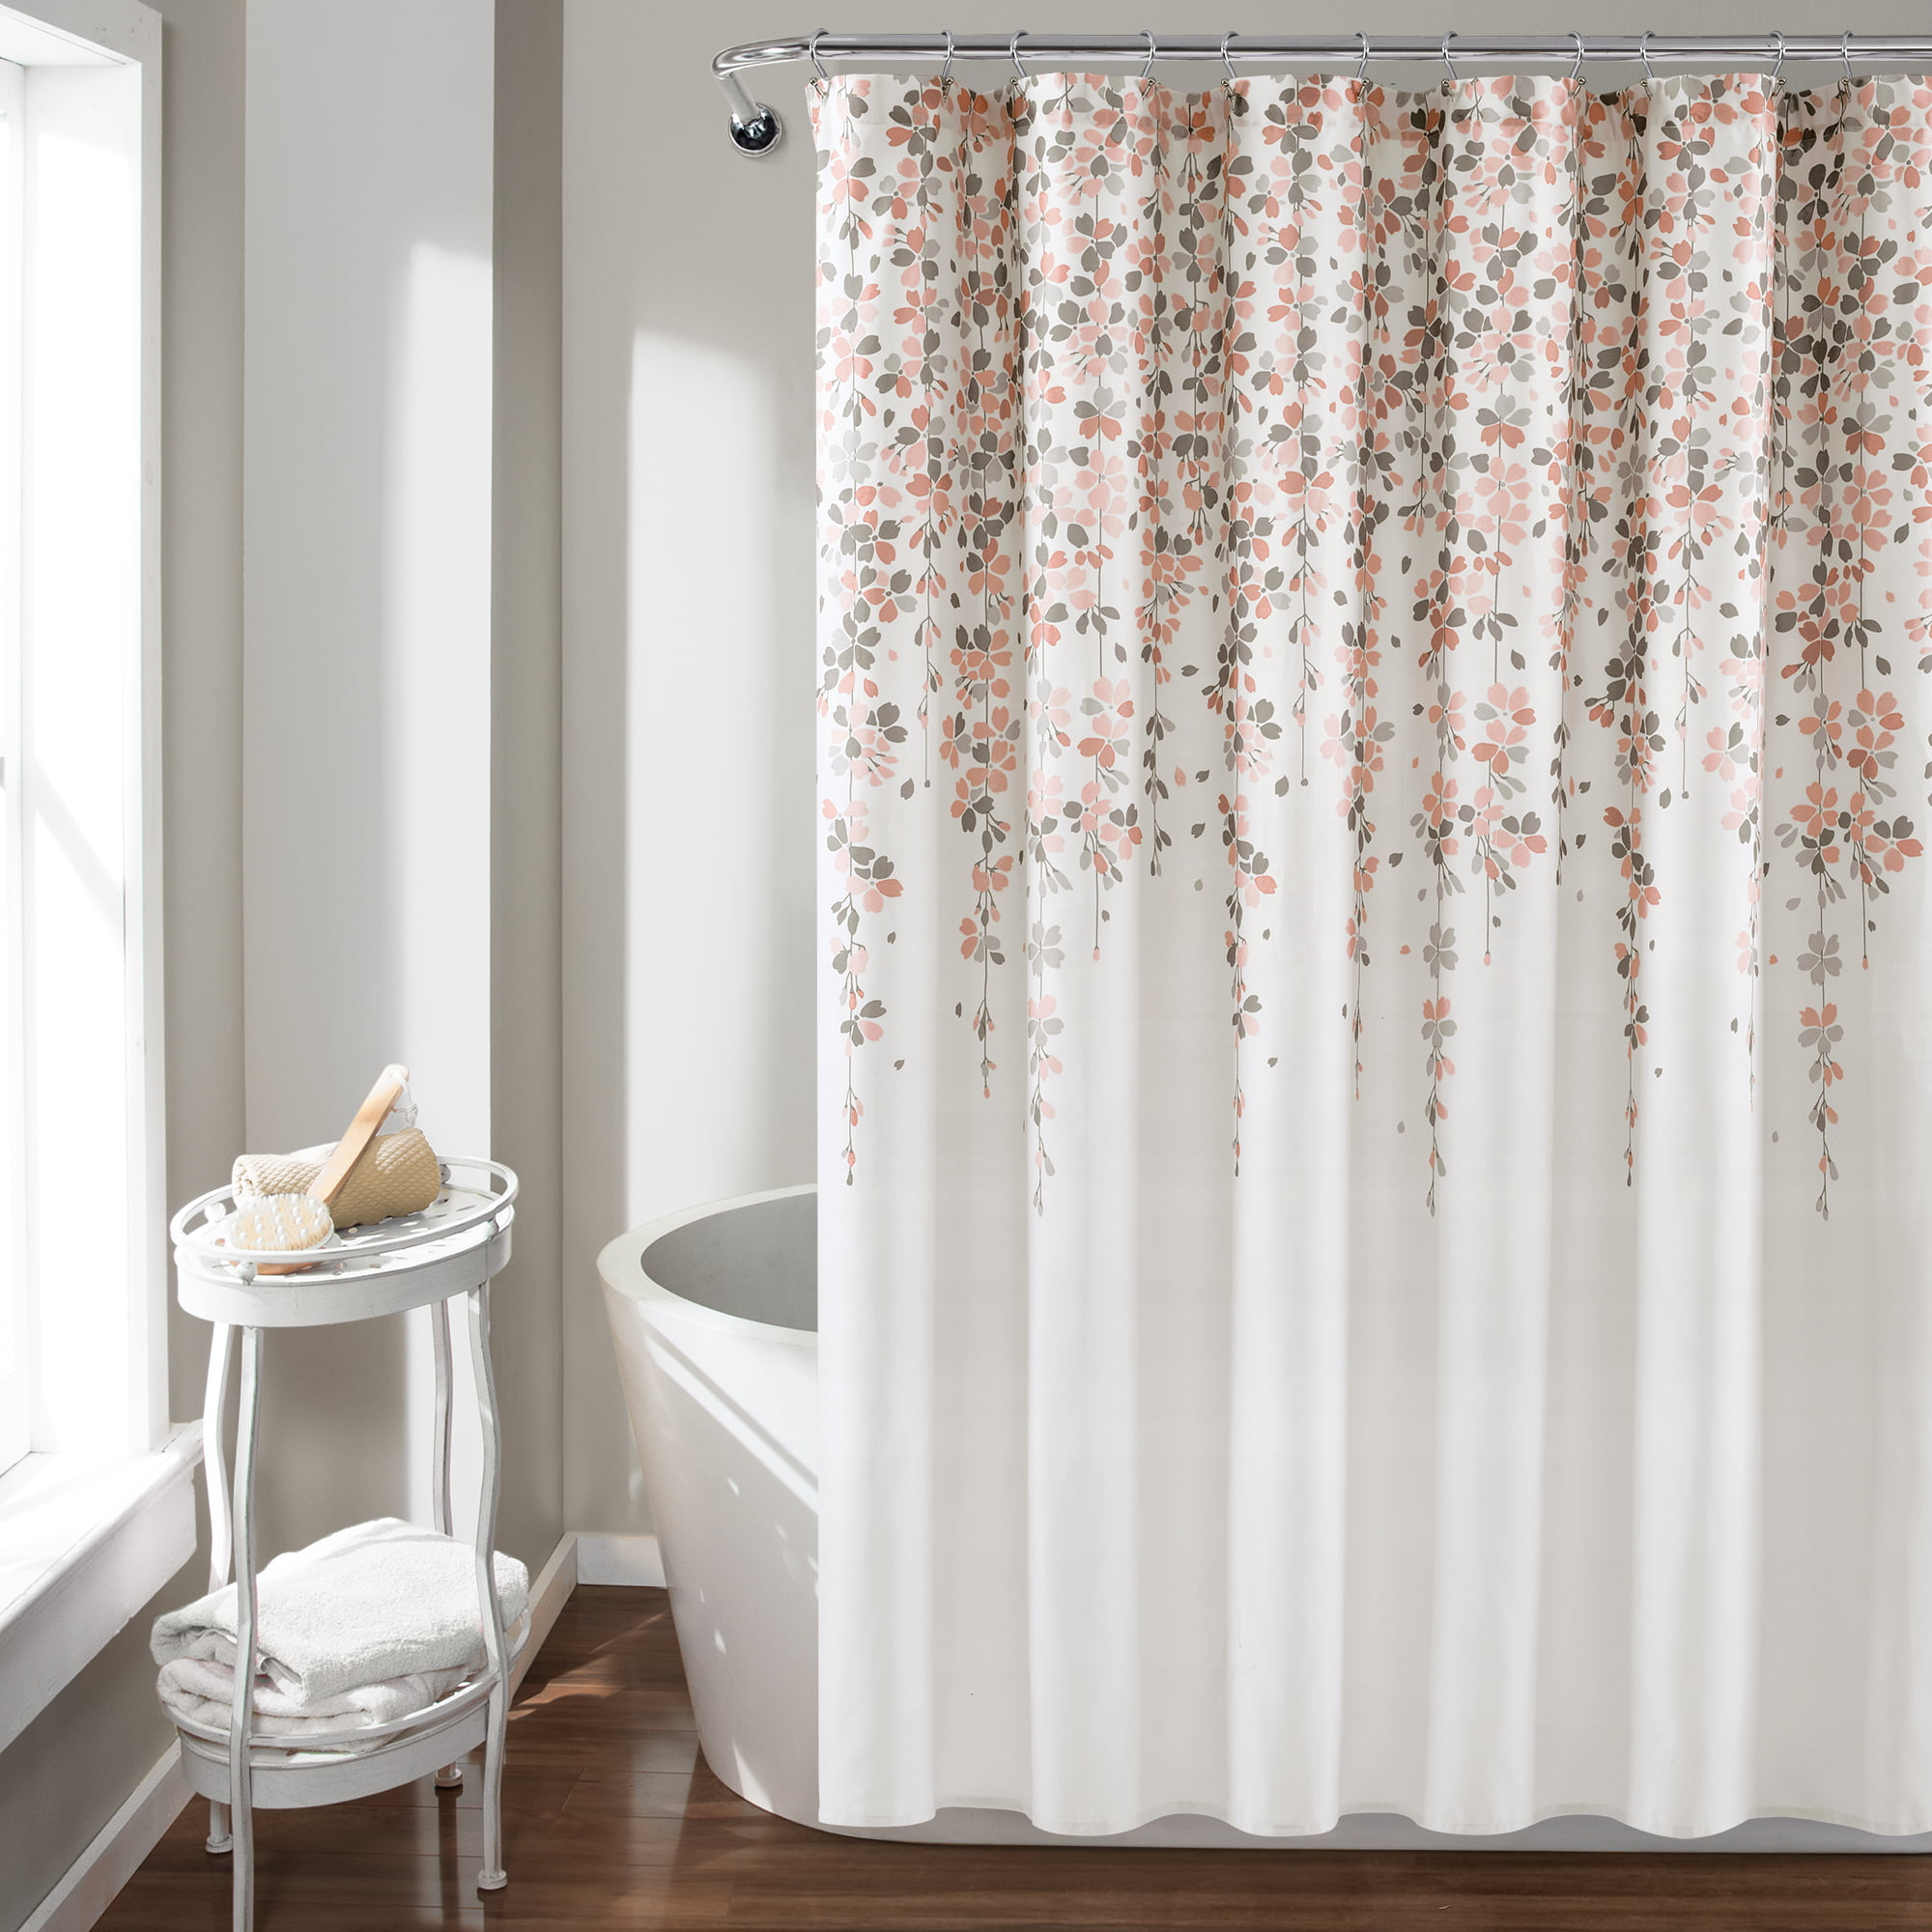 Lush Decor Weeping Flower Shower Curtain 72x72 Blush Gray Single Walmart Com Walmart Com